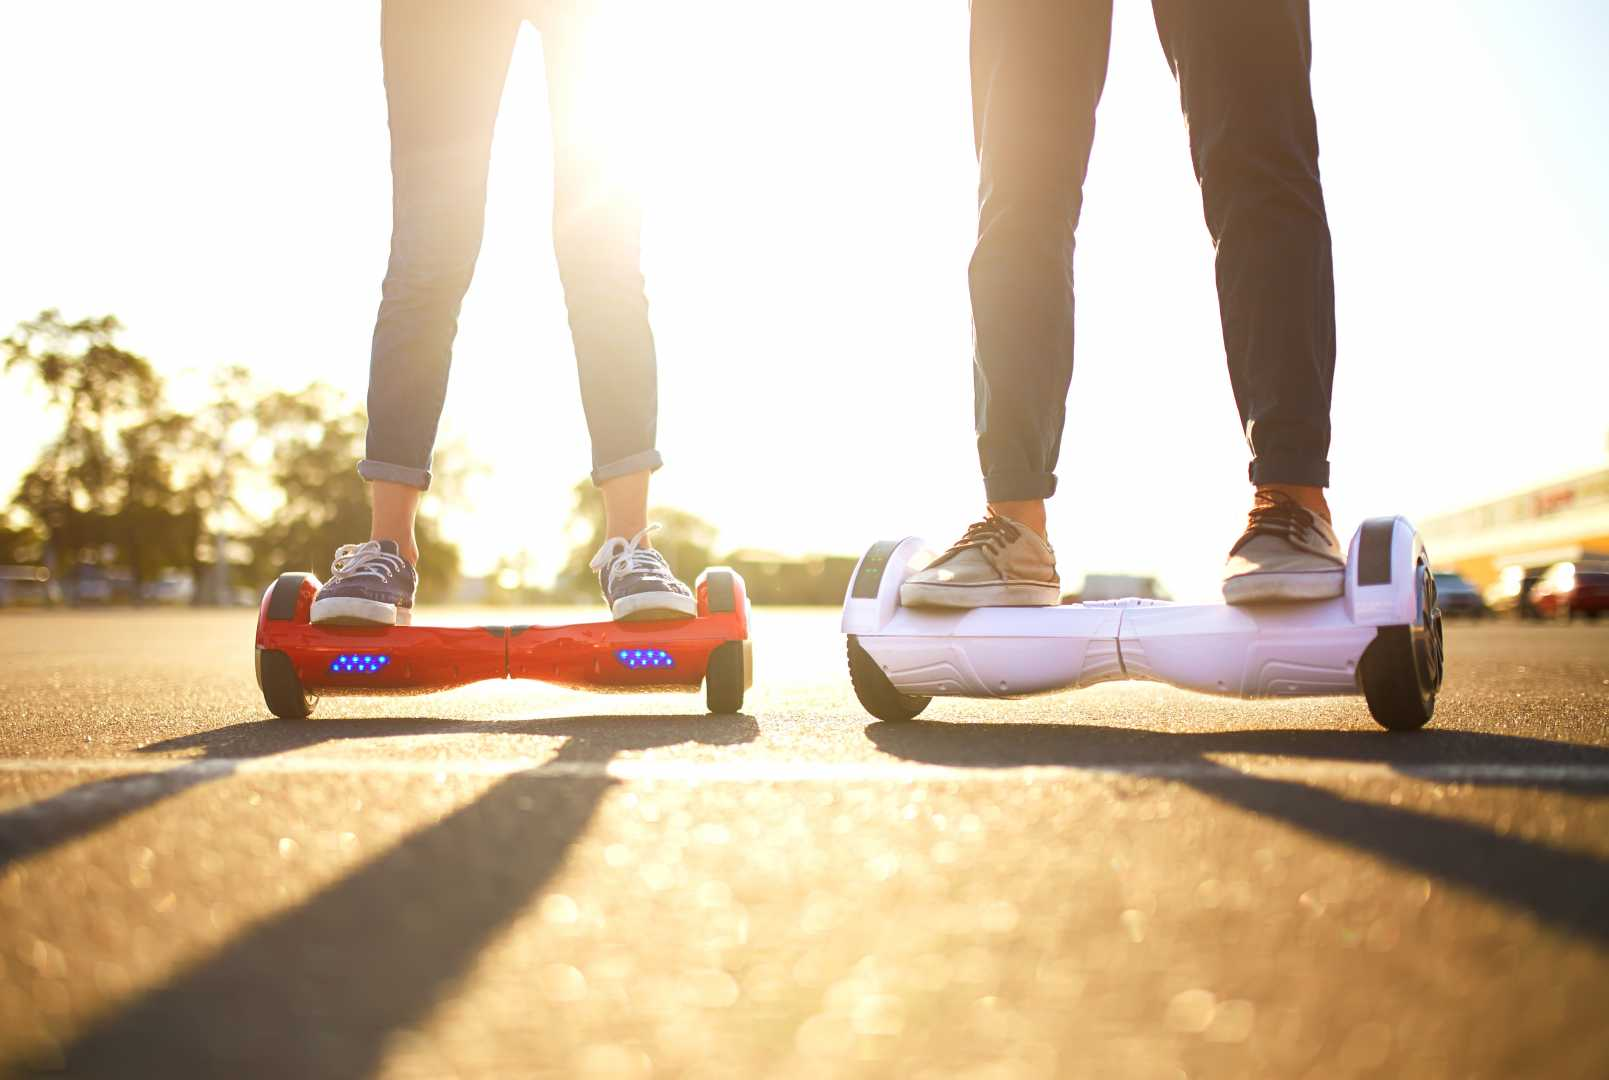 Hooverboards